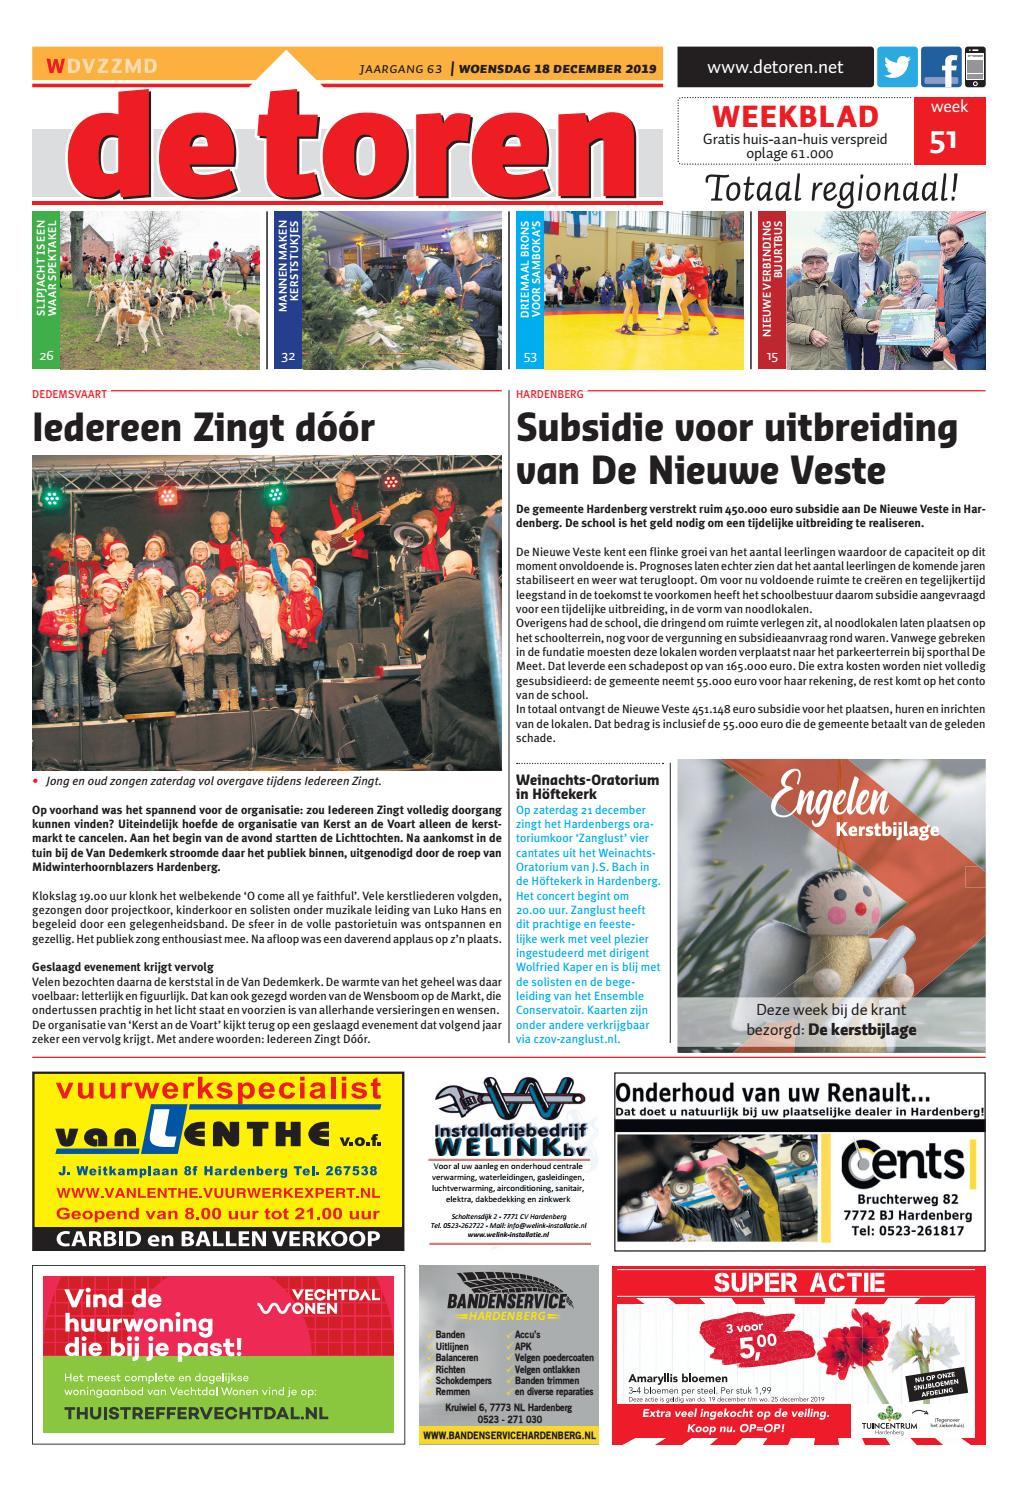 Weekblad De Toren Week 51 2019 By Weekblad De Toren Issuu